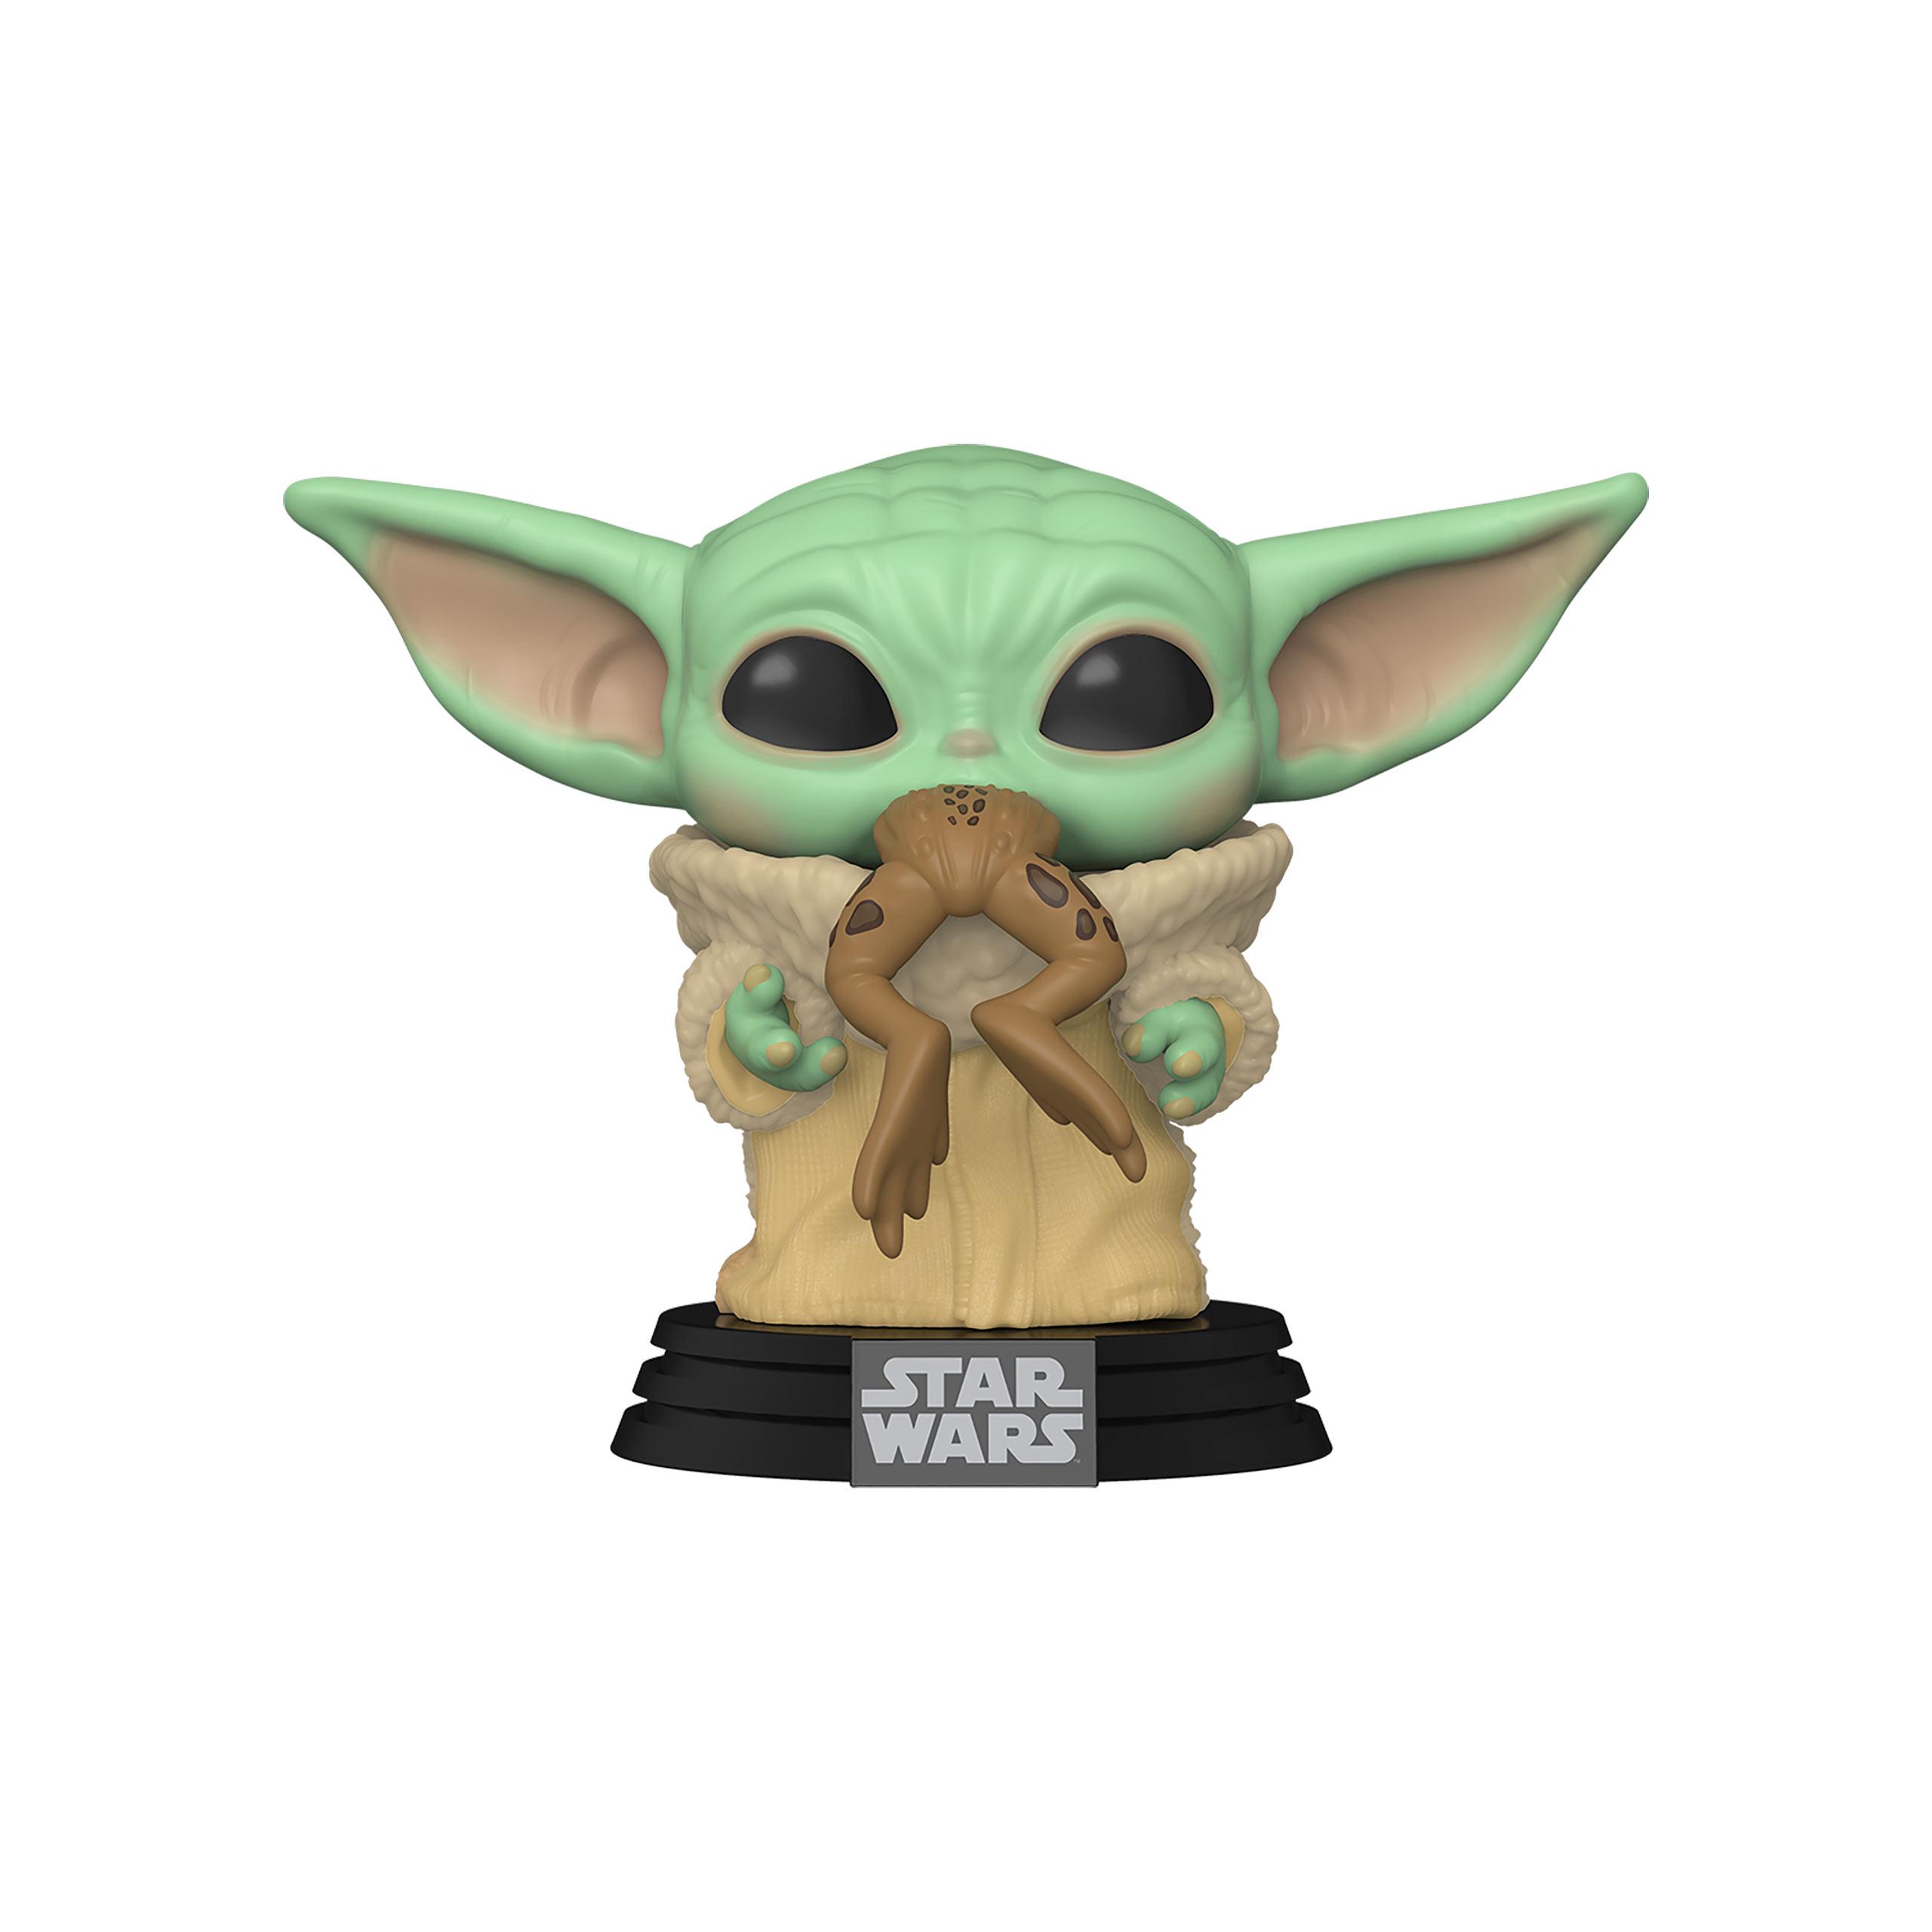 The Child mit Frosch Funko Pop Wackelkopf-Figur - Star Wars The Mandalorian